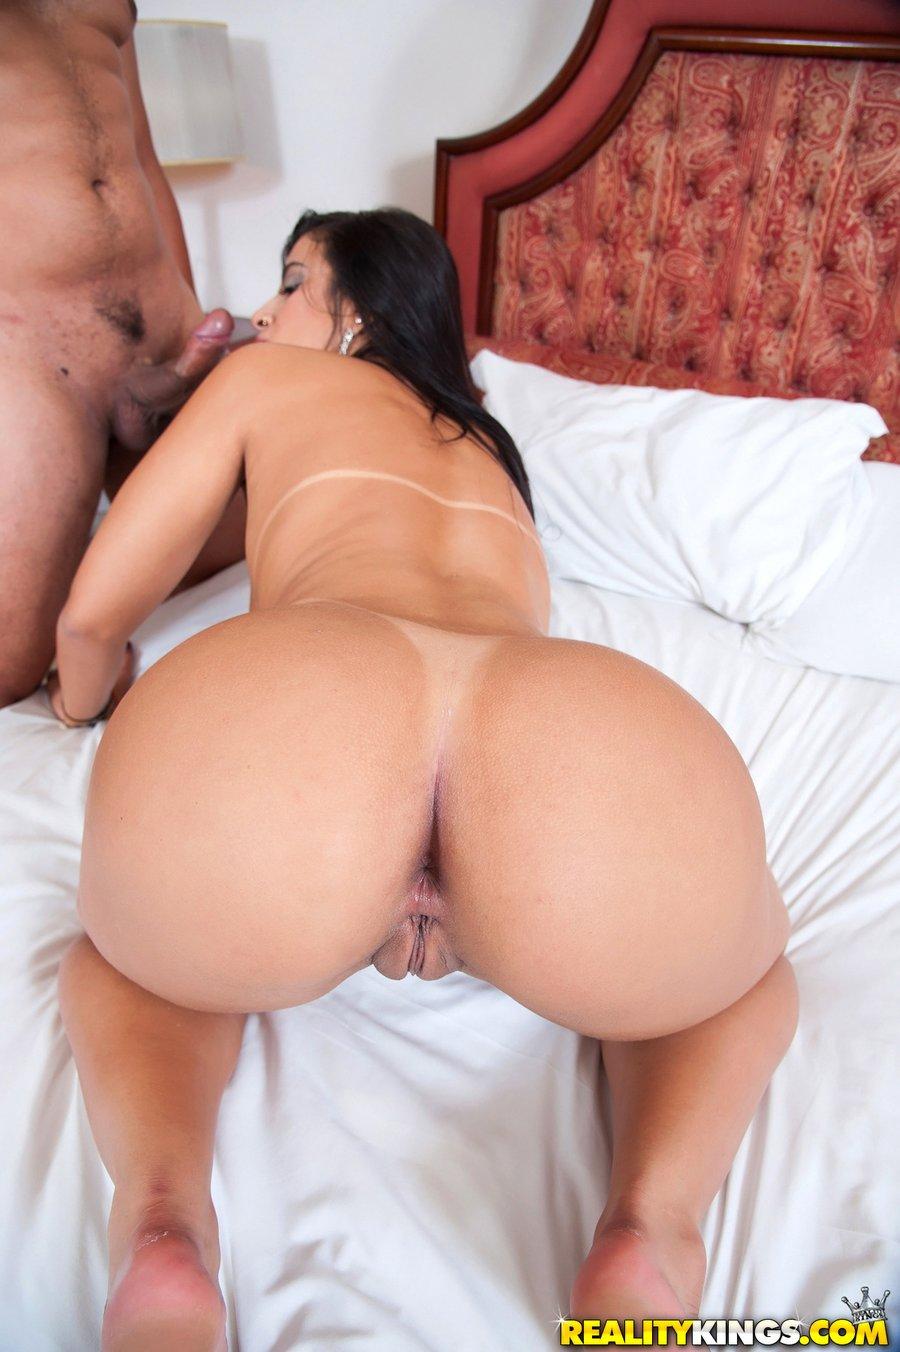 Babe milf nudist asians